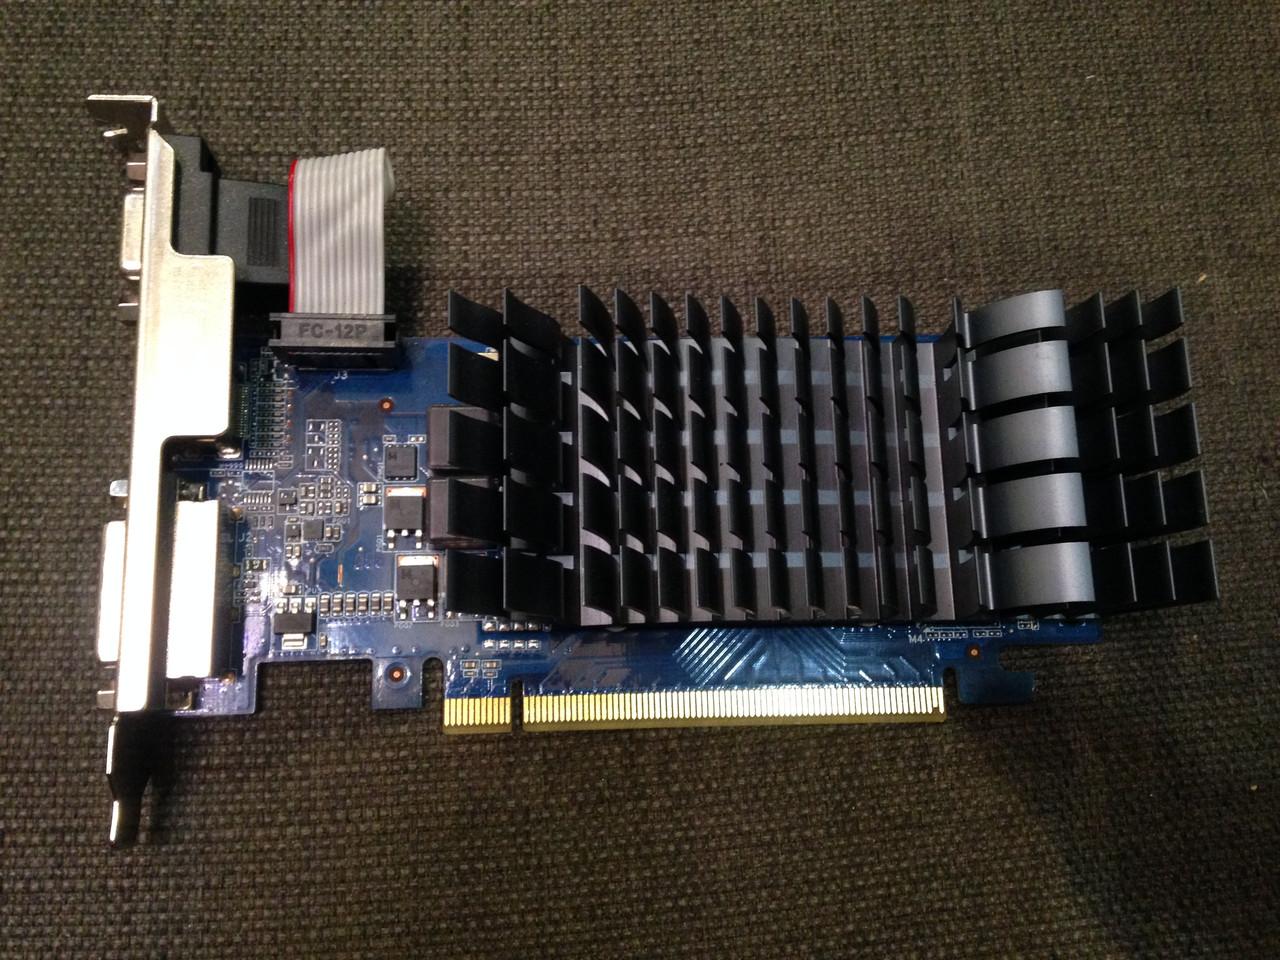 ВИДЕОКАРТА Pci-E GEFORCE c HDMI : GT210 на 1 GB DDR3 с ГАРАНТИЕЙ ( видеоадаптер GT 210 1gb  )